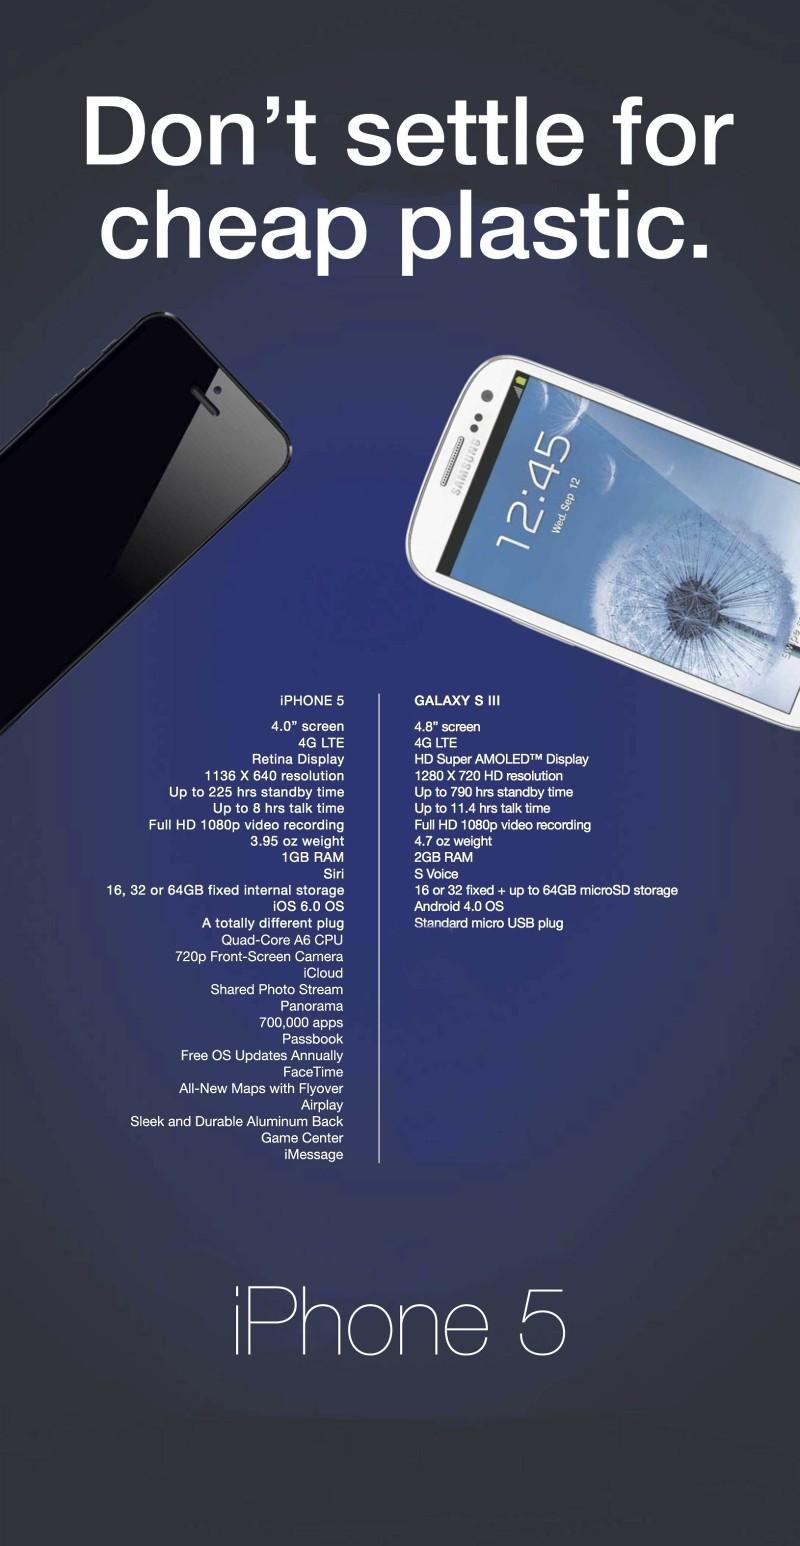 Cartel Apple Fans Samsung Galaxy S III vs iPhone 5